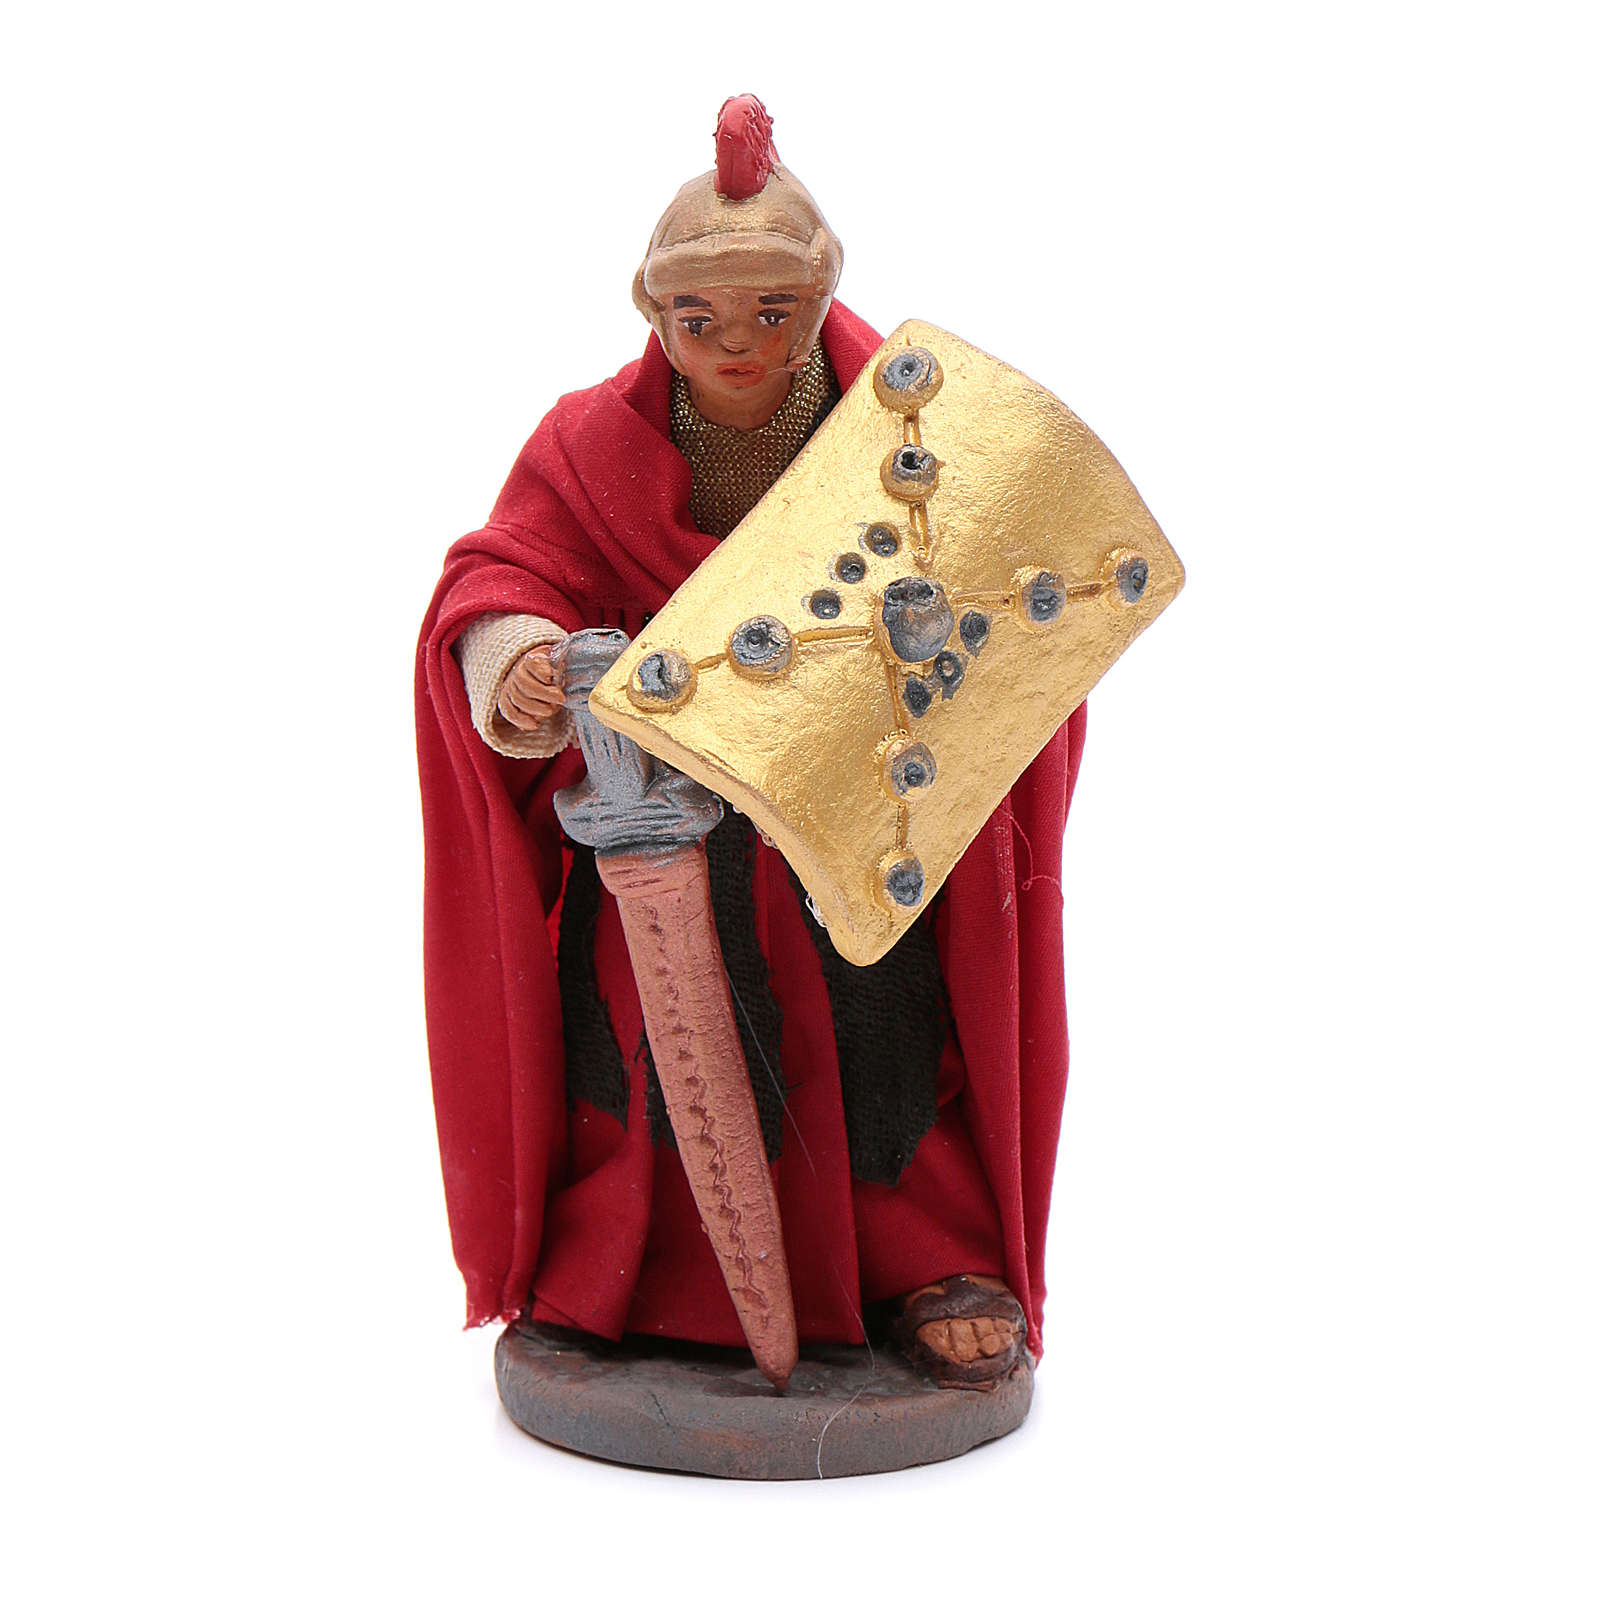 Soldier with sword 10 cm Neapolitan Nativity figurine 4